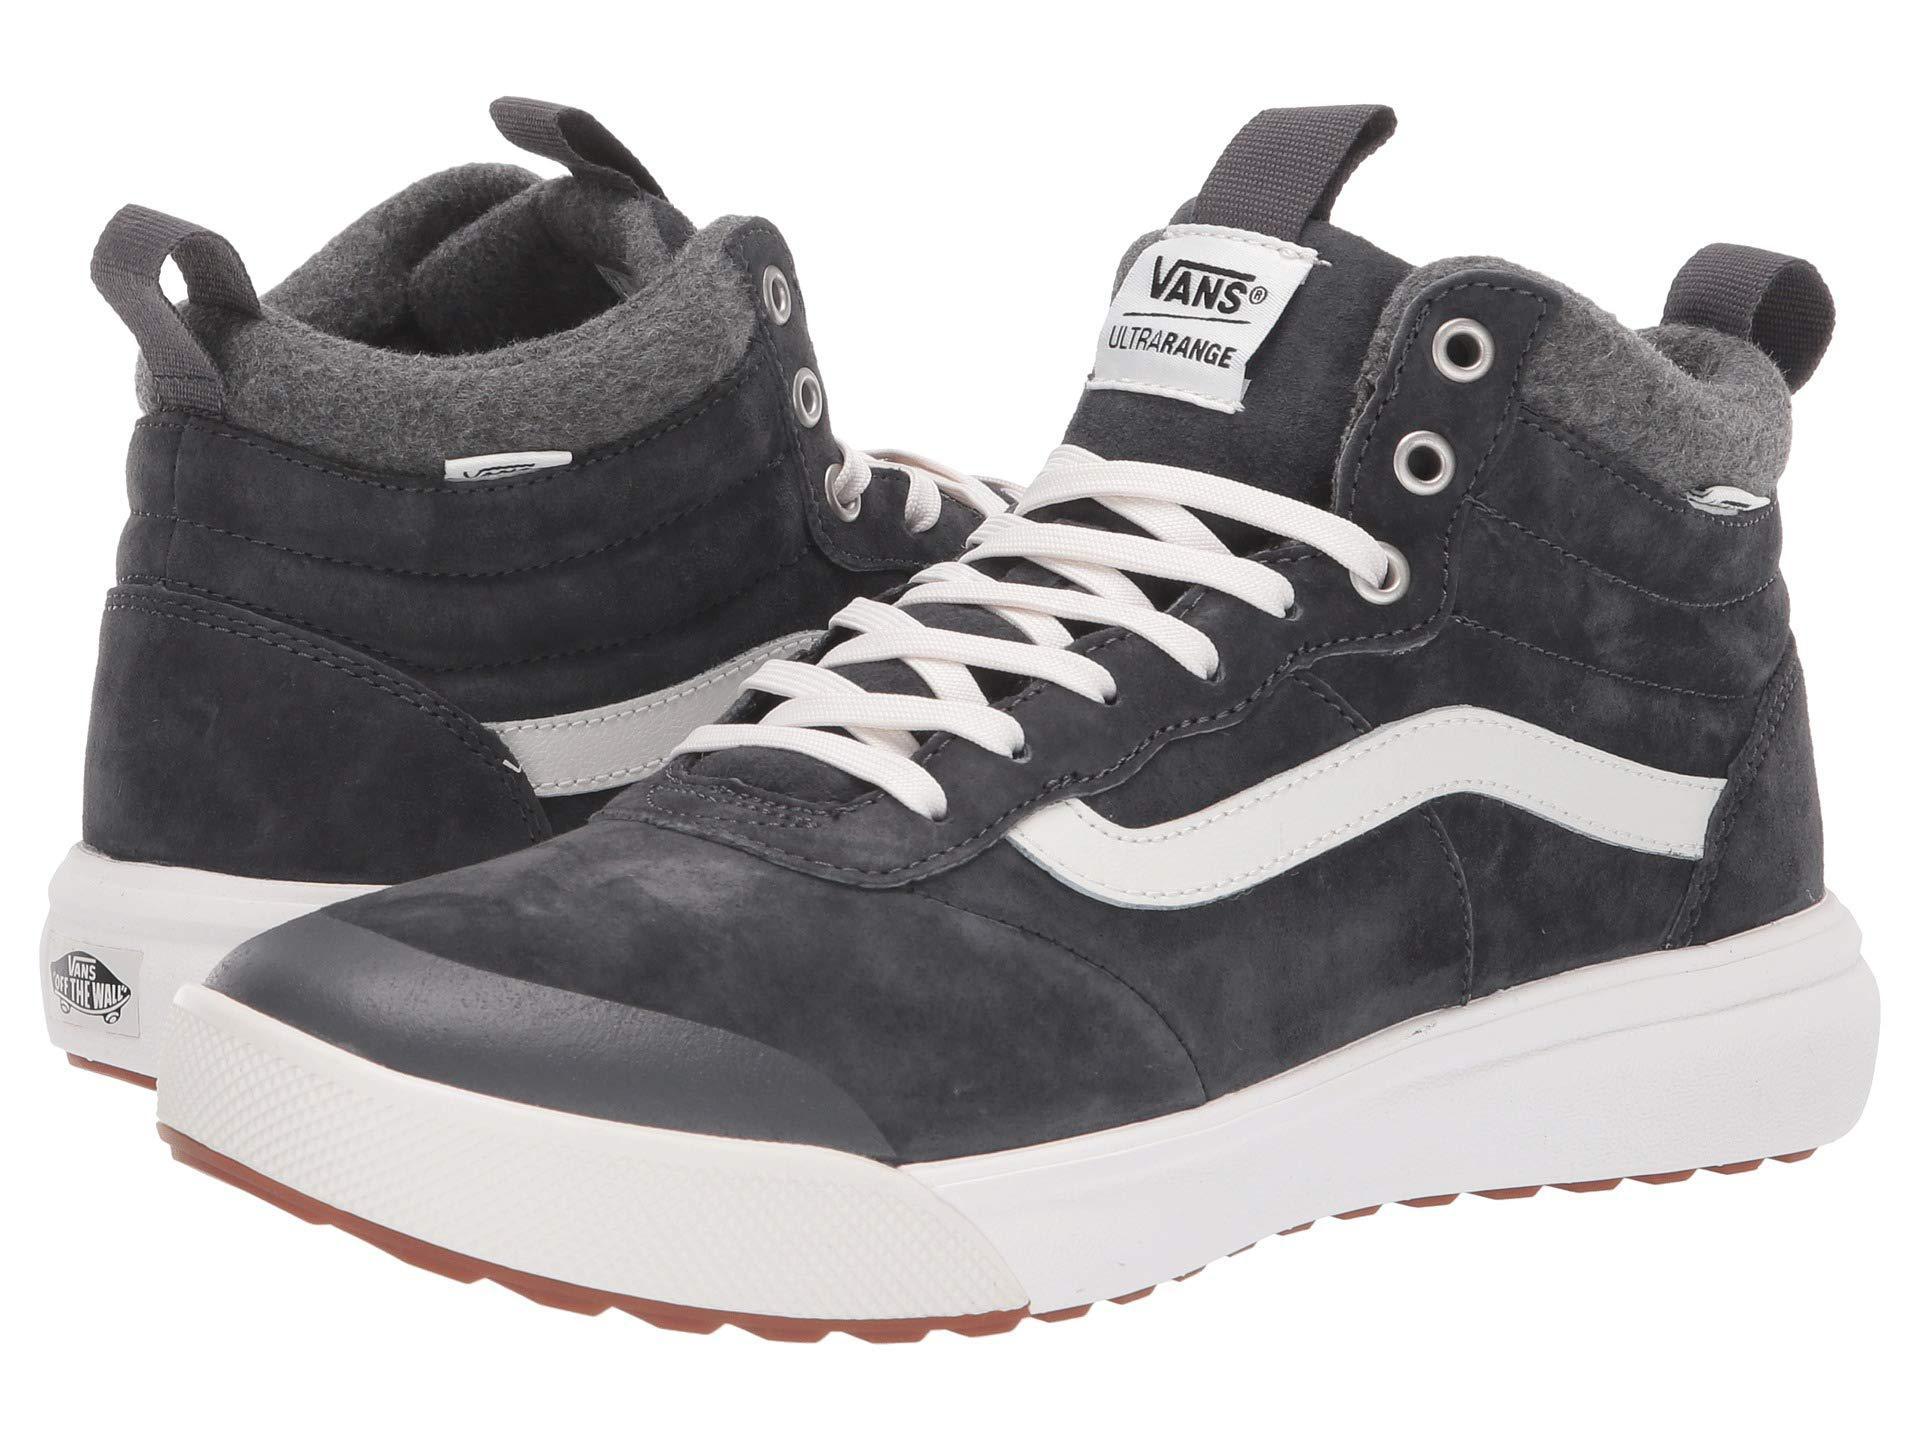 Lyst - Vans Ultrarange Hi Mte ((wool) Frost Gray) Skate Shoes a5800975d